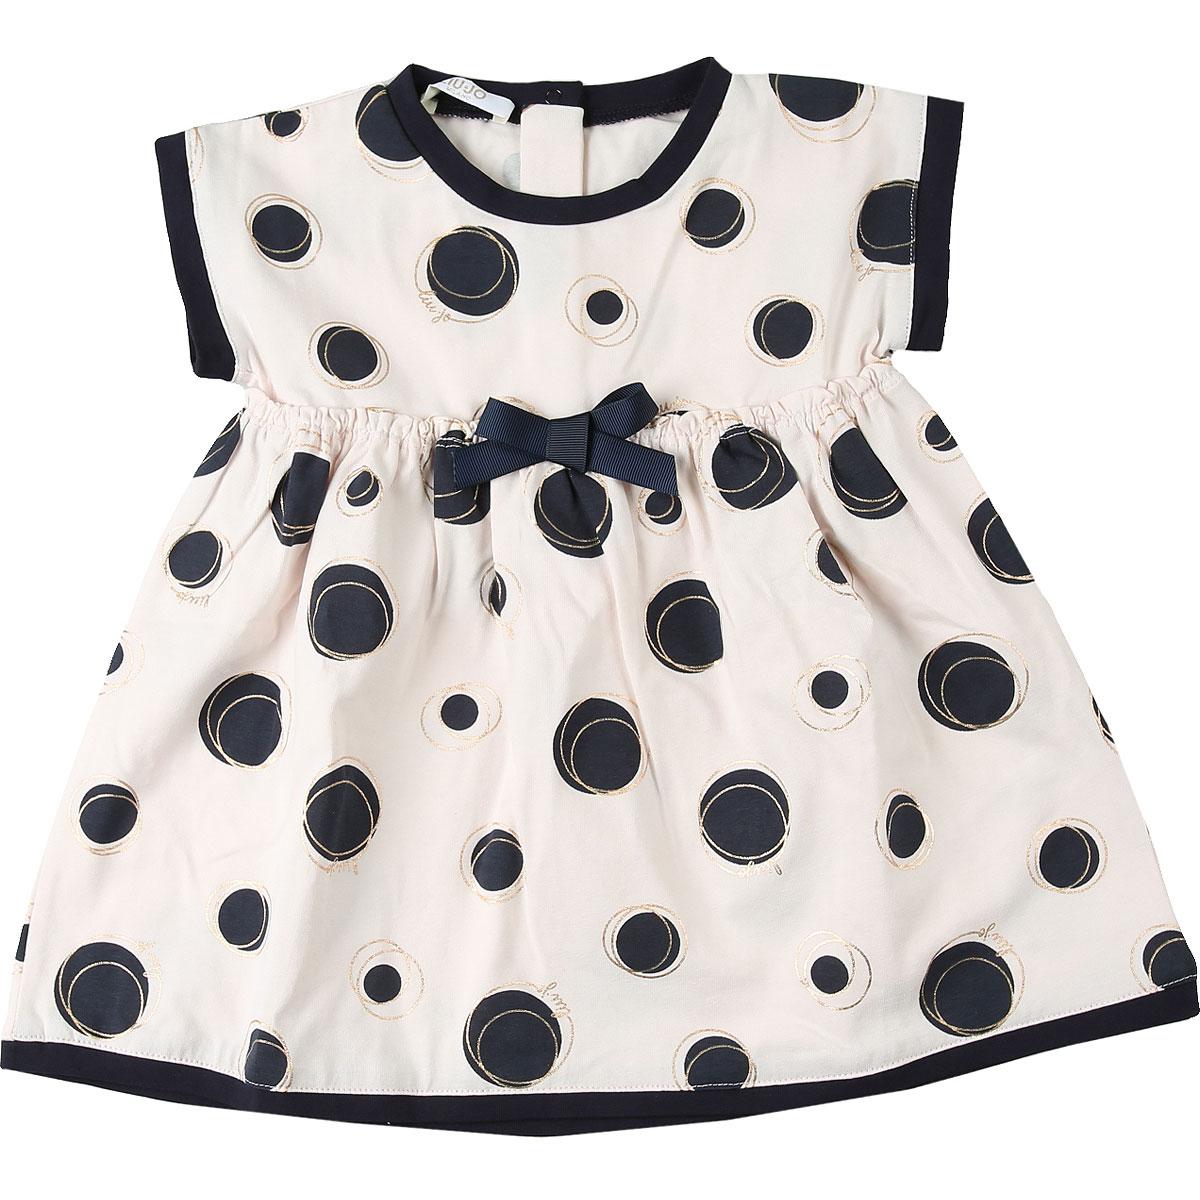 Liu Jo Baby Dress for Girls On Sale, Pink, Cotton, 2019, 18M 6M